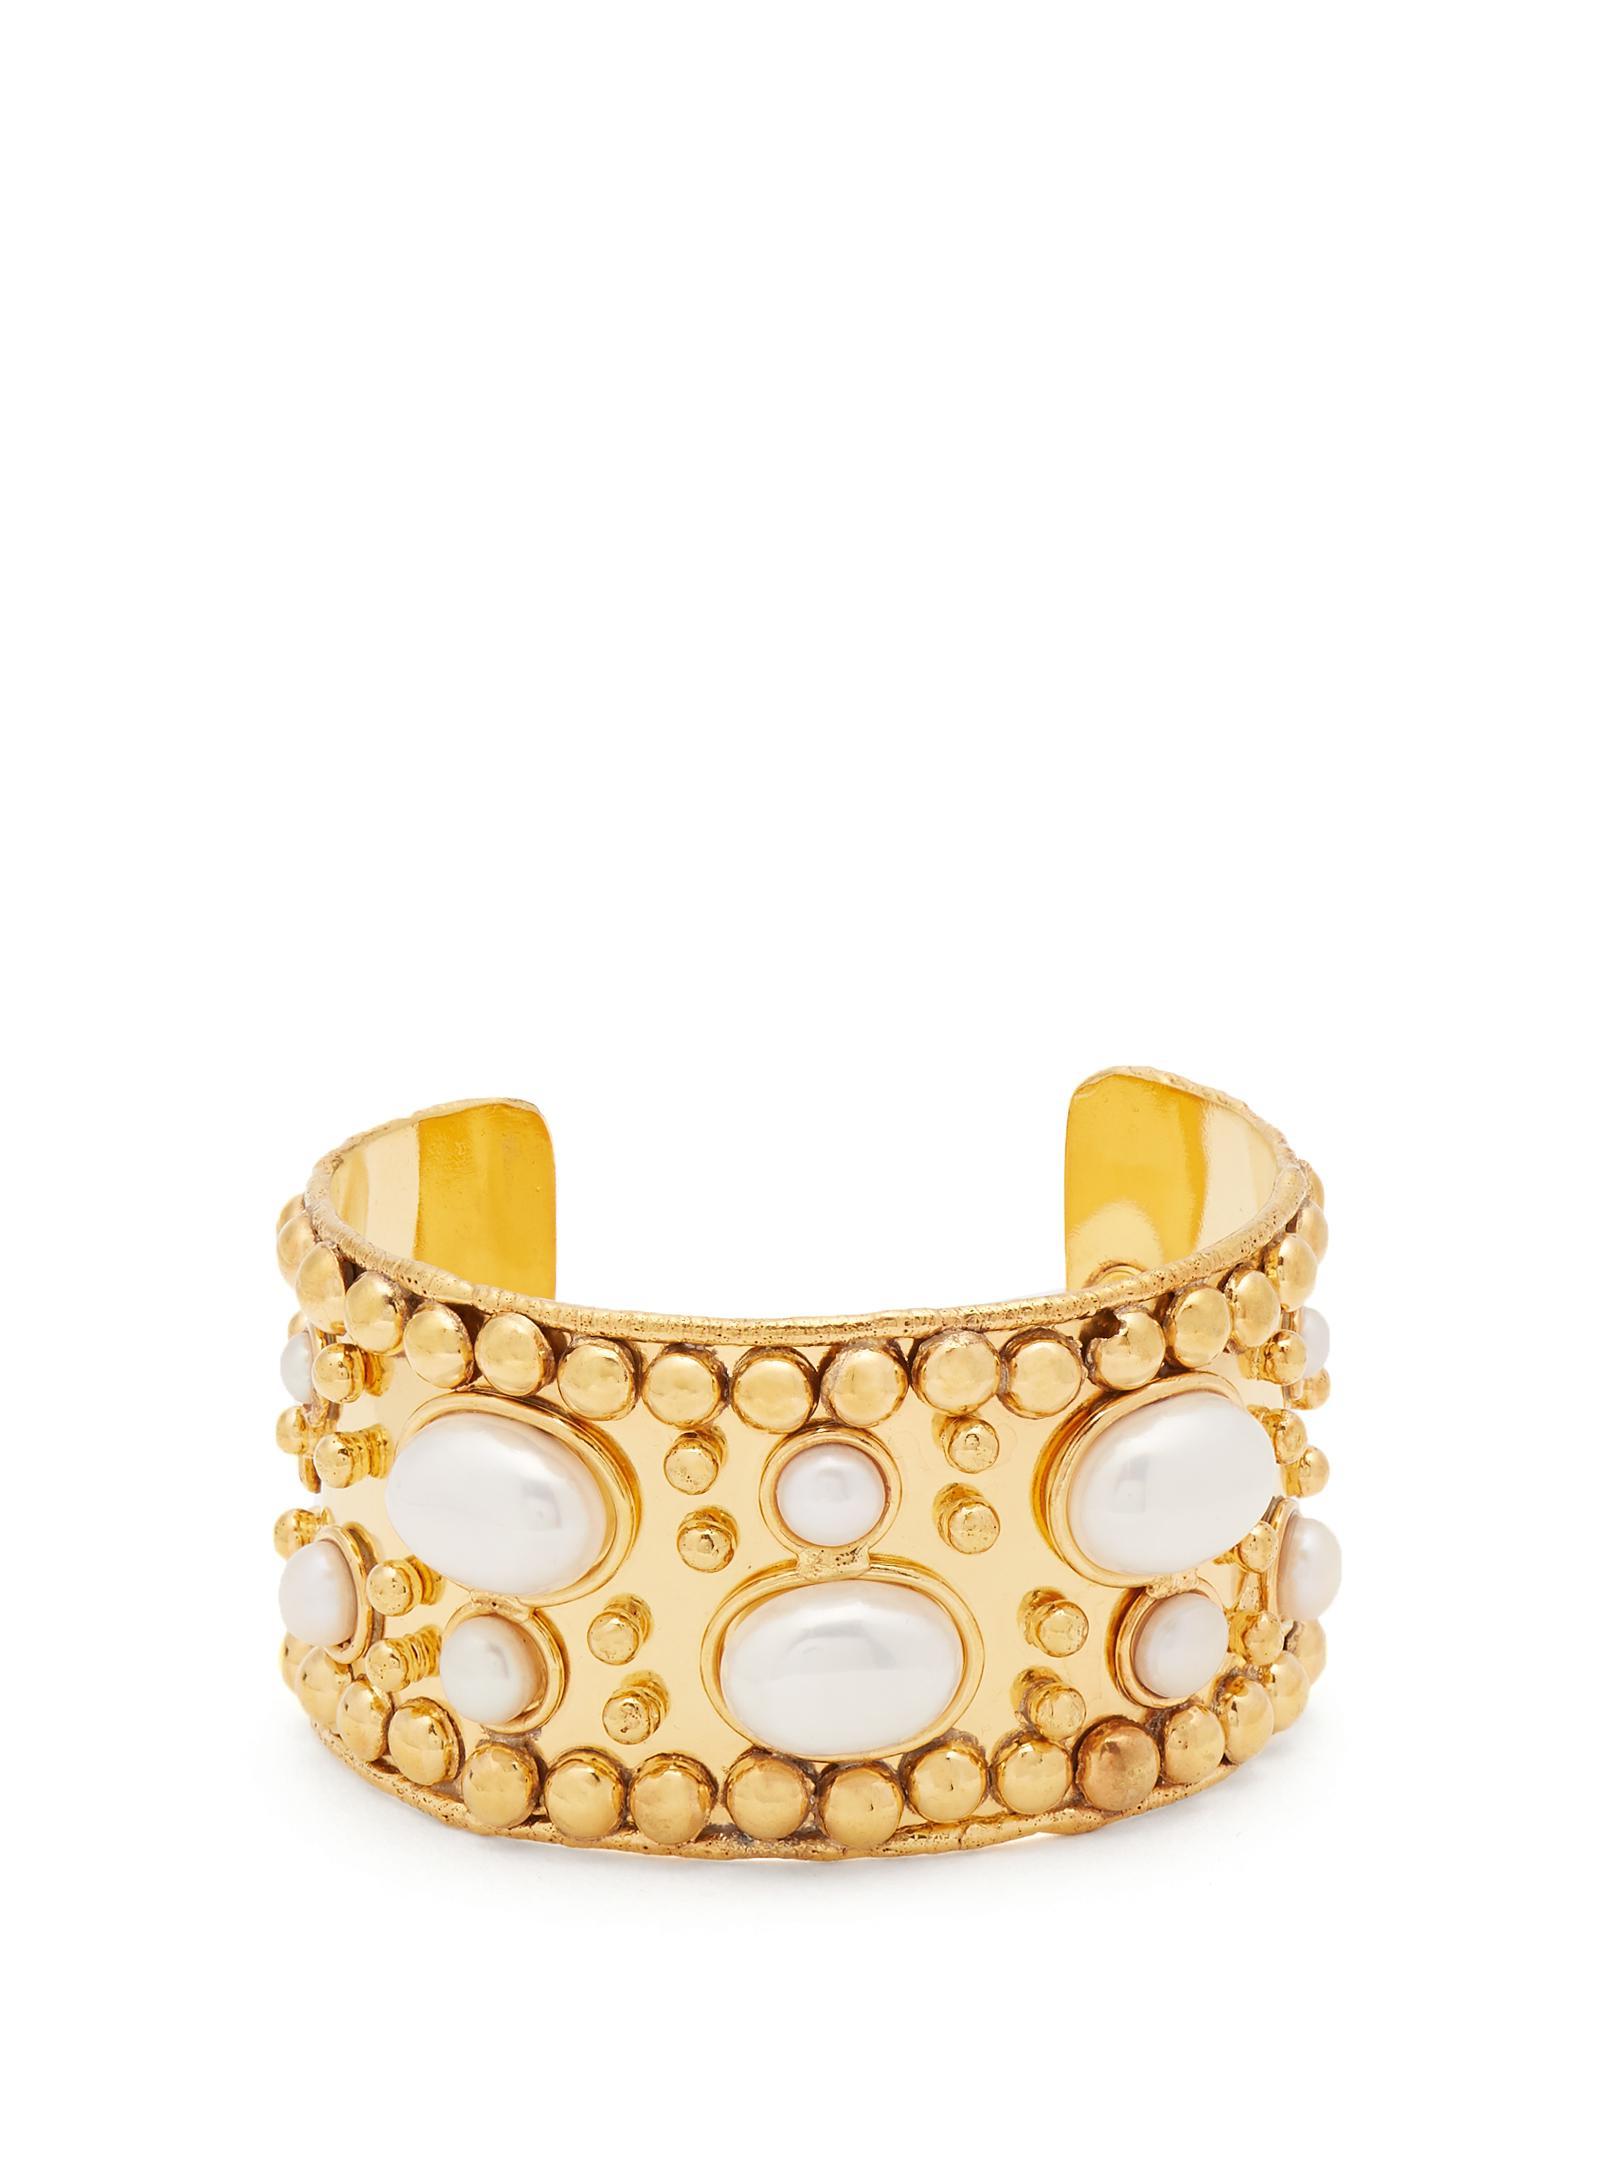 Sylvia Toledano Stone Massaii Cuff Bracelet in Gold-Plated Brass DJagWCpP